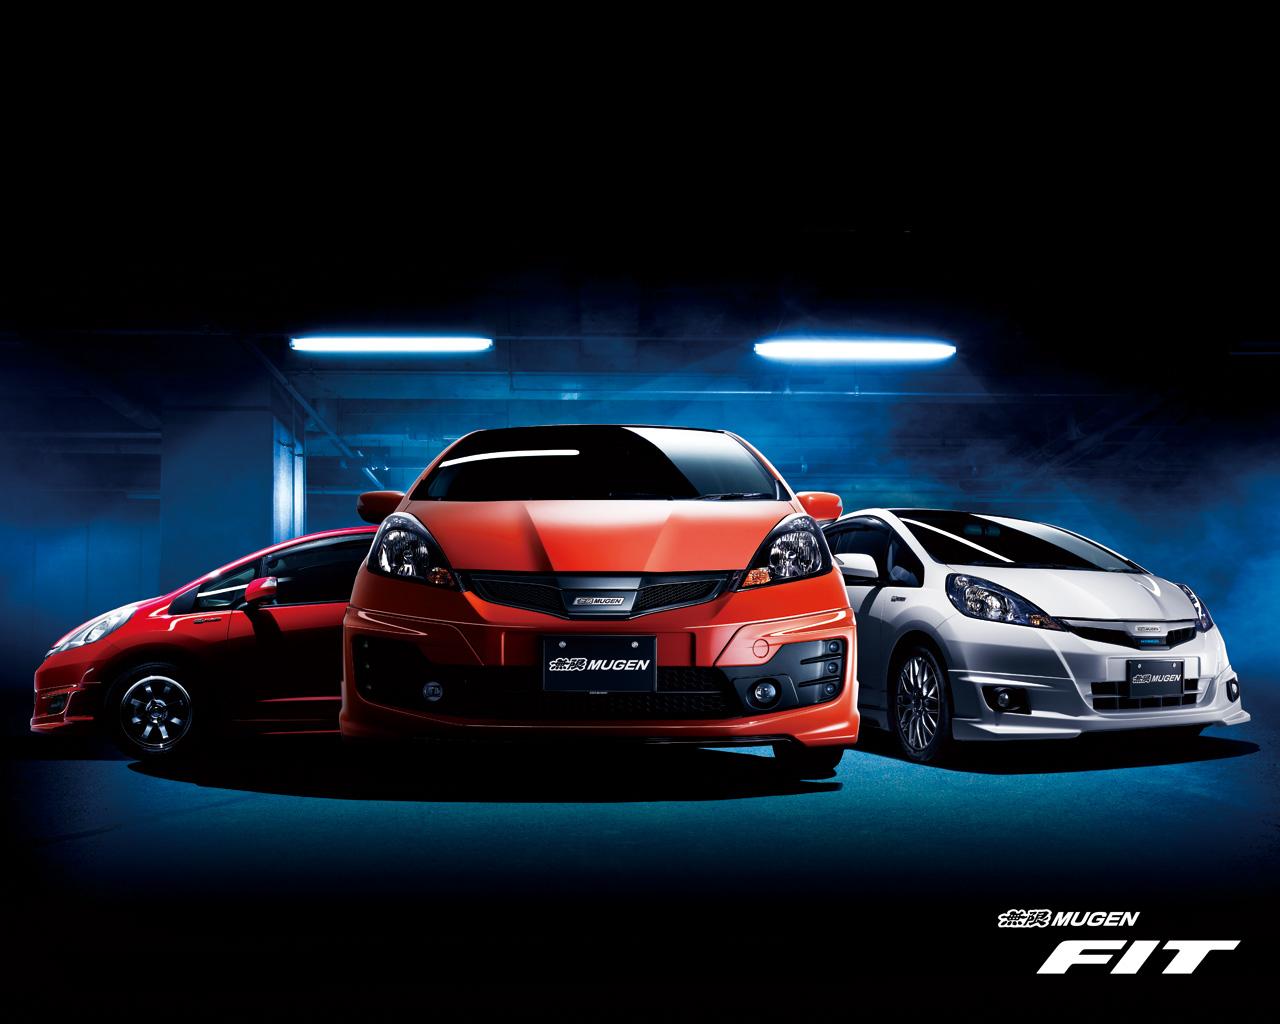 Japanese Tuning cars   Mugen Fit   Honda wallpapers 1280x1024